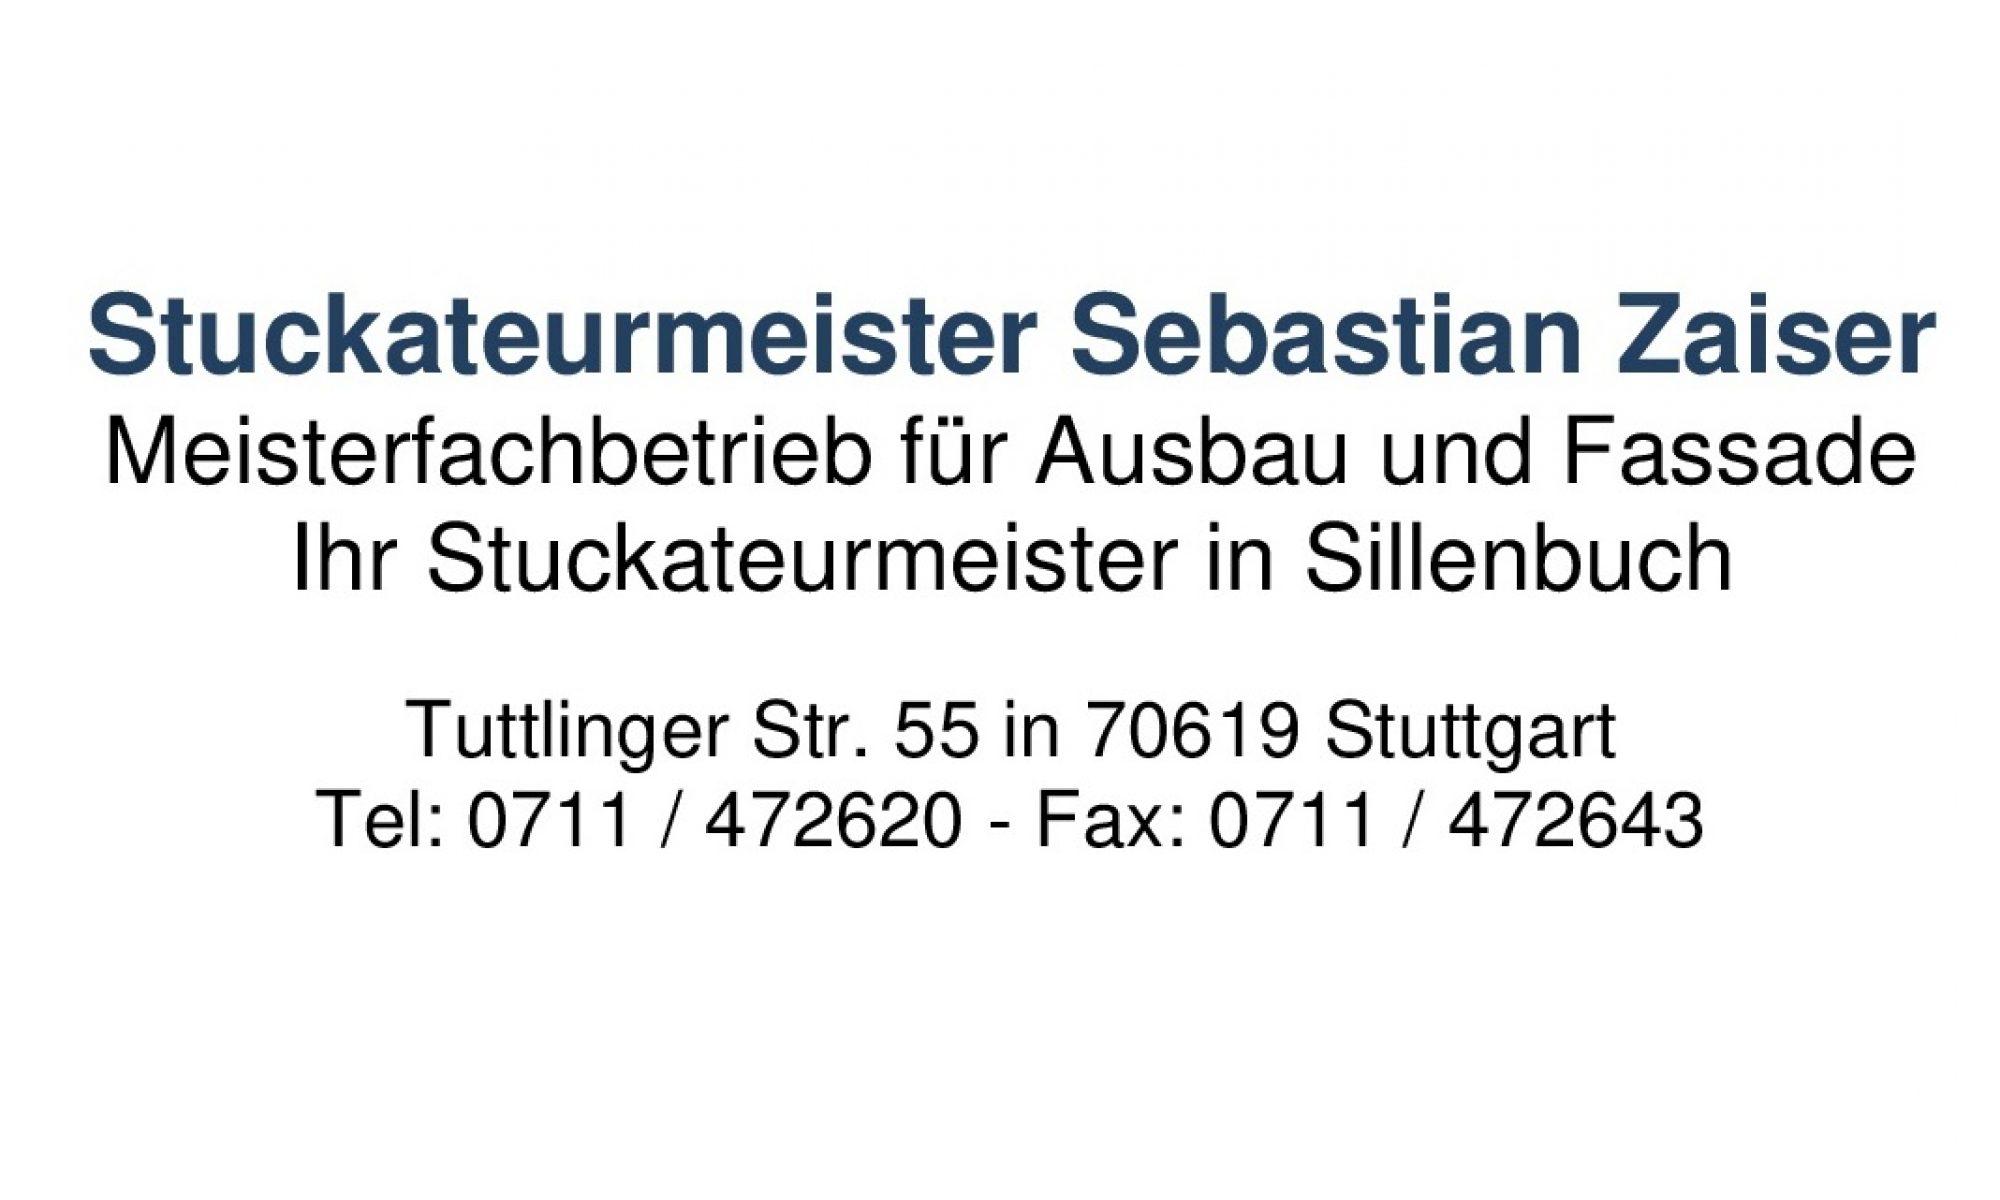 Stuckateurbetrieb Sebastian Zaiser